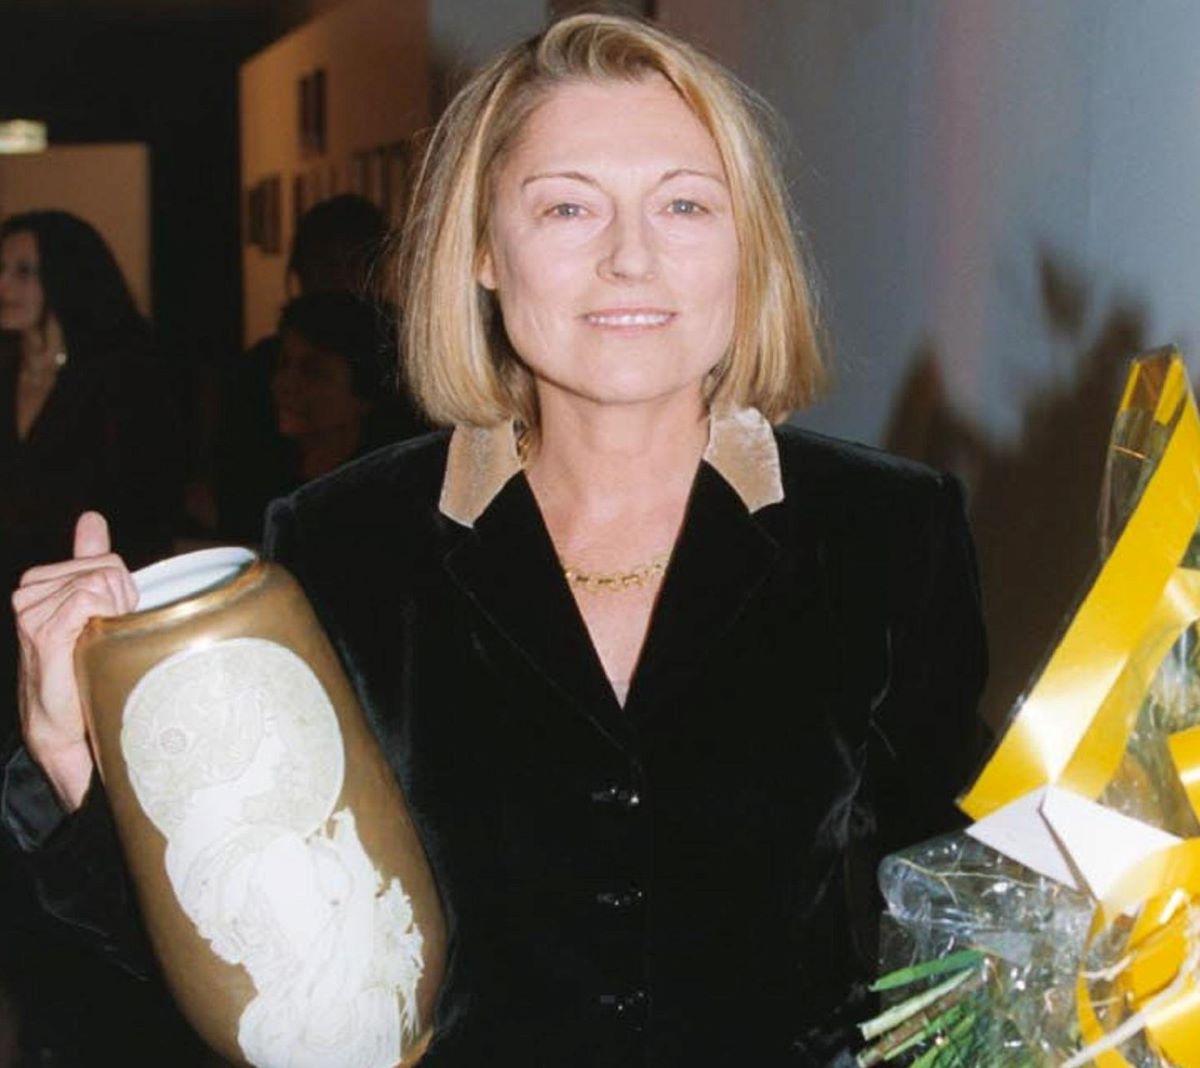 Clare Peploe Morta Sceneggiatrice Lutto Cinema Moglie Bernardo Bertolucci